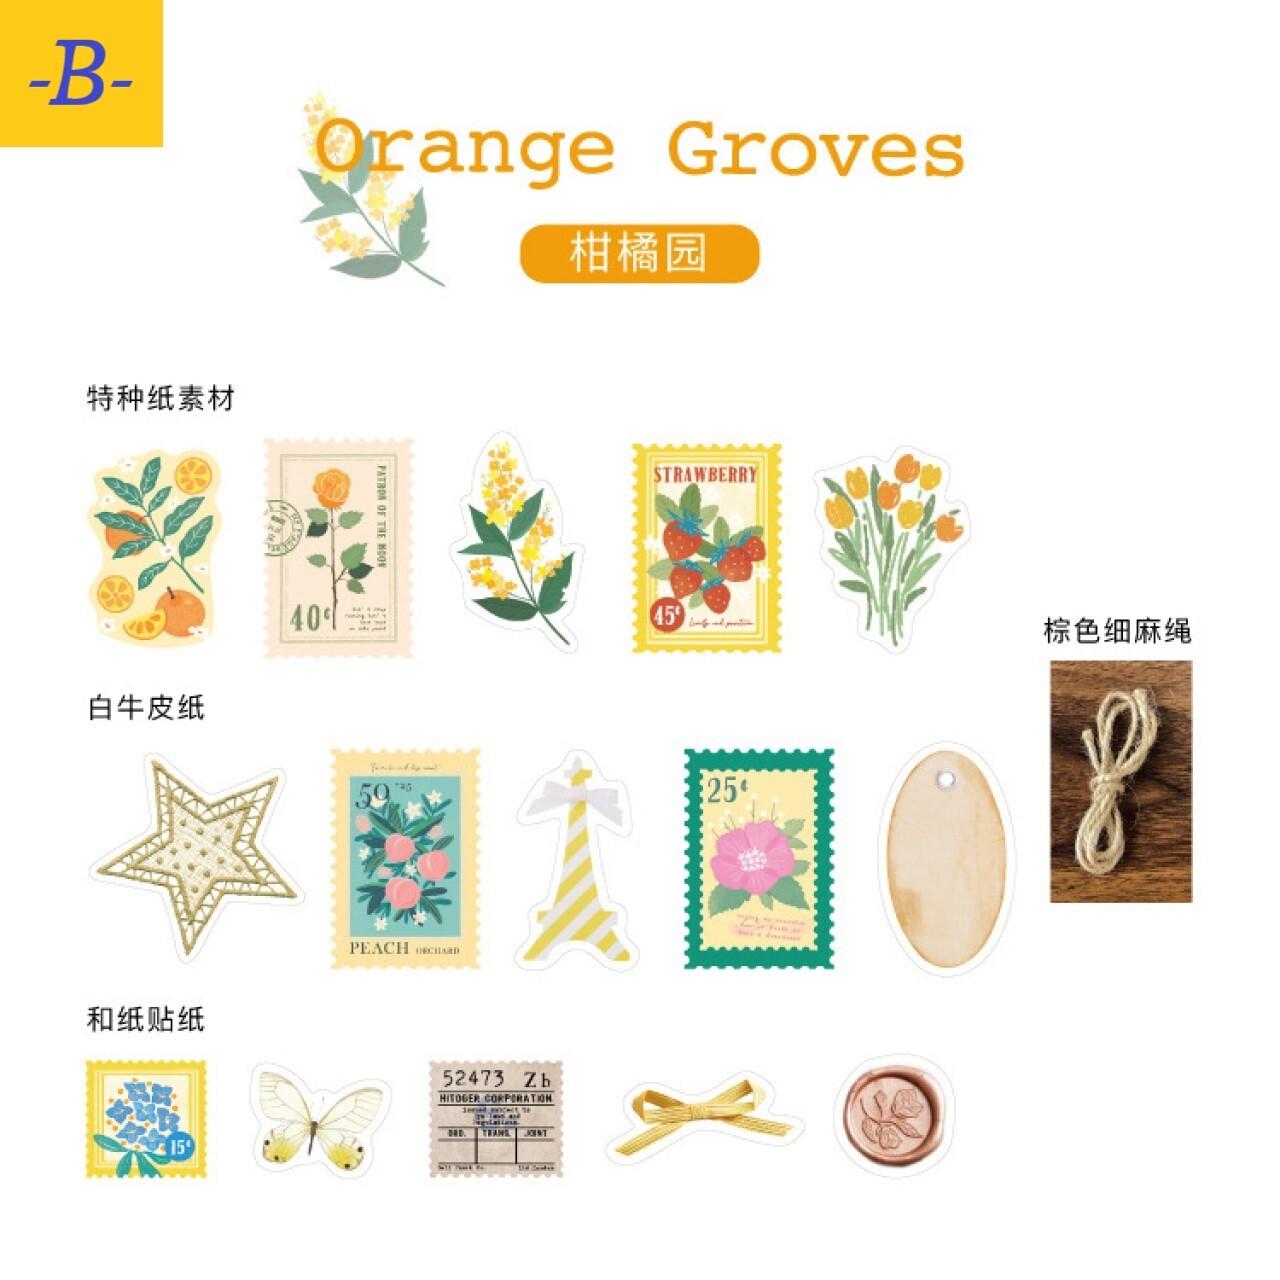 E03 コラージュ素材一式 全6種 シール 紙もの 麻縄 ほぼ日手帳 ミニサイズ 蝶